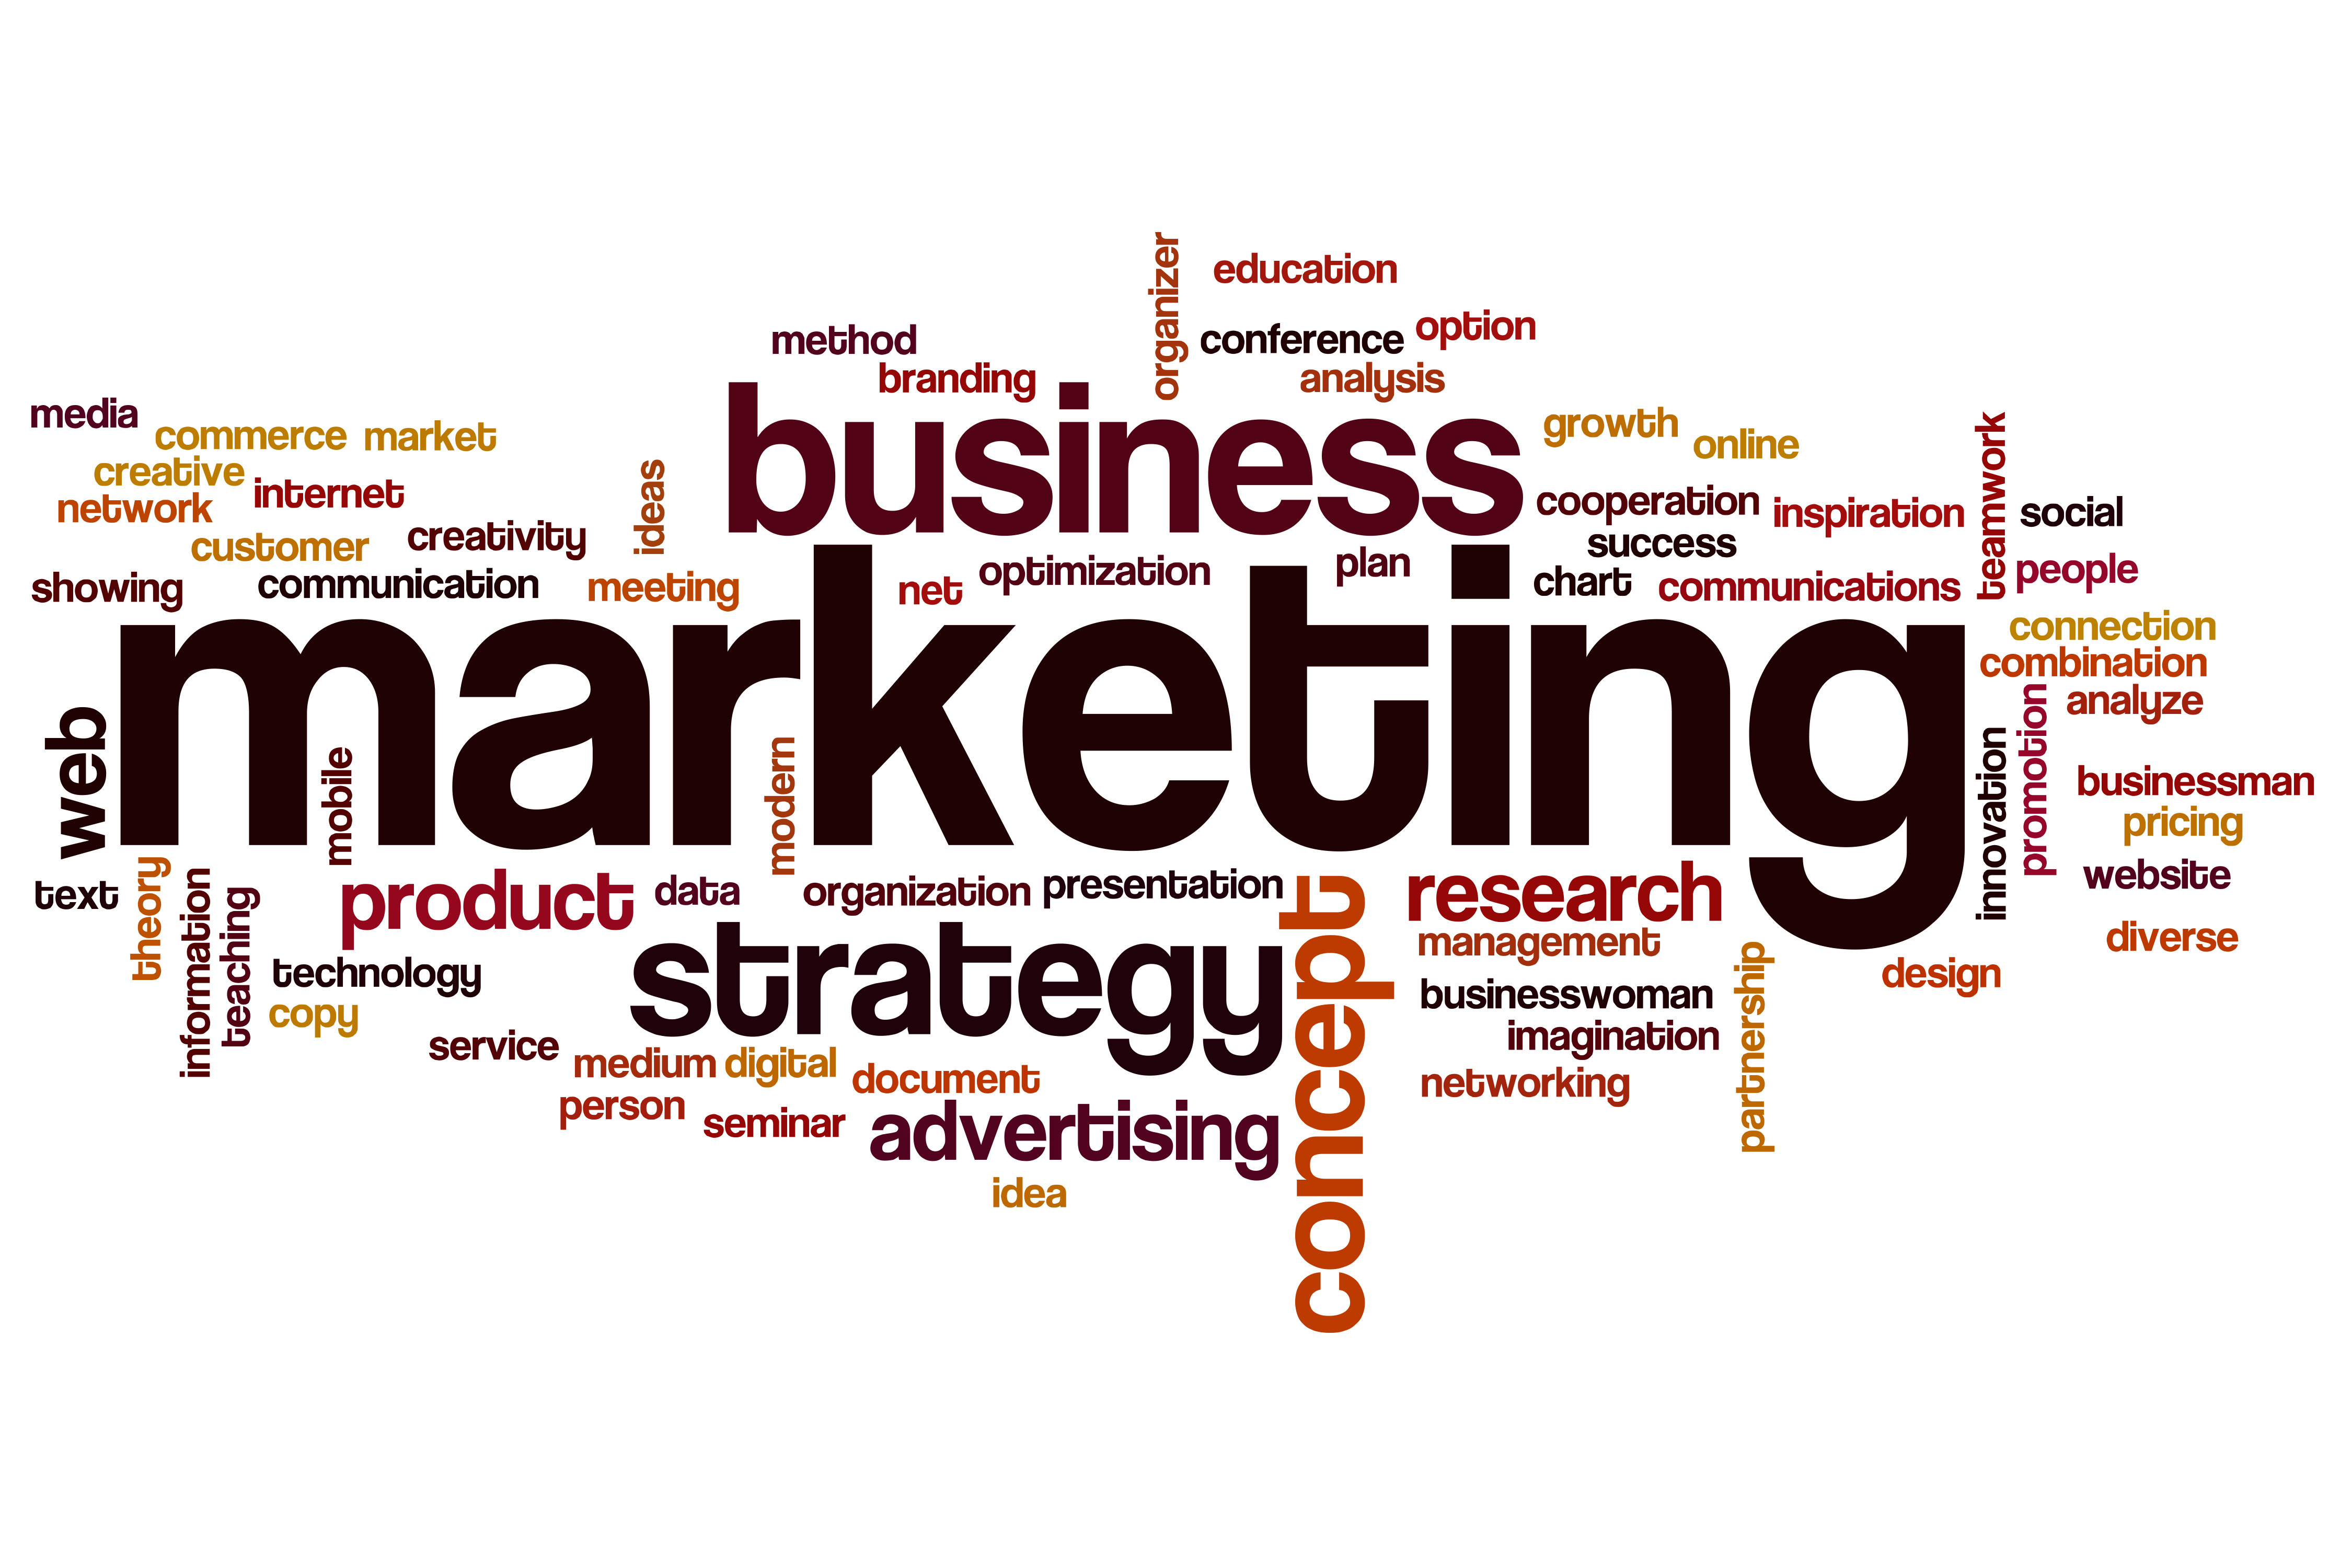 Internet marketing support